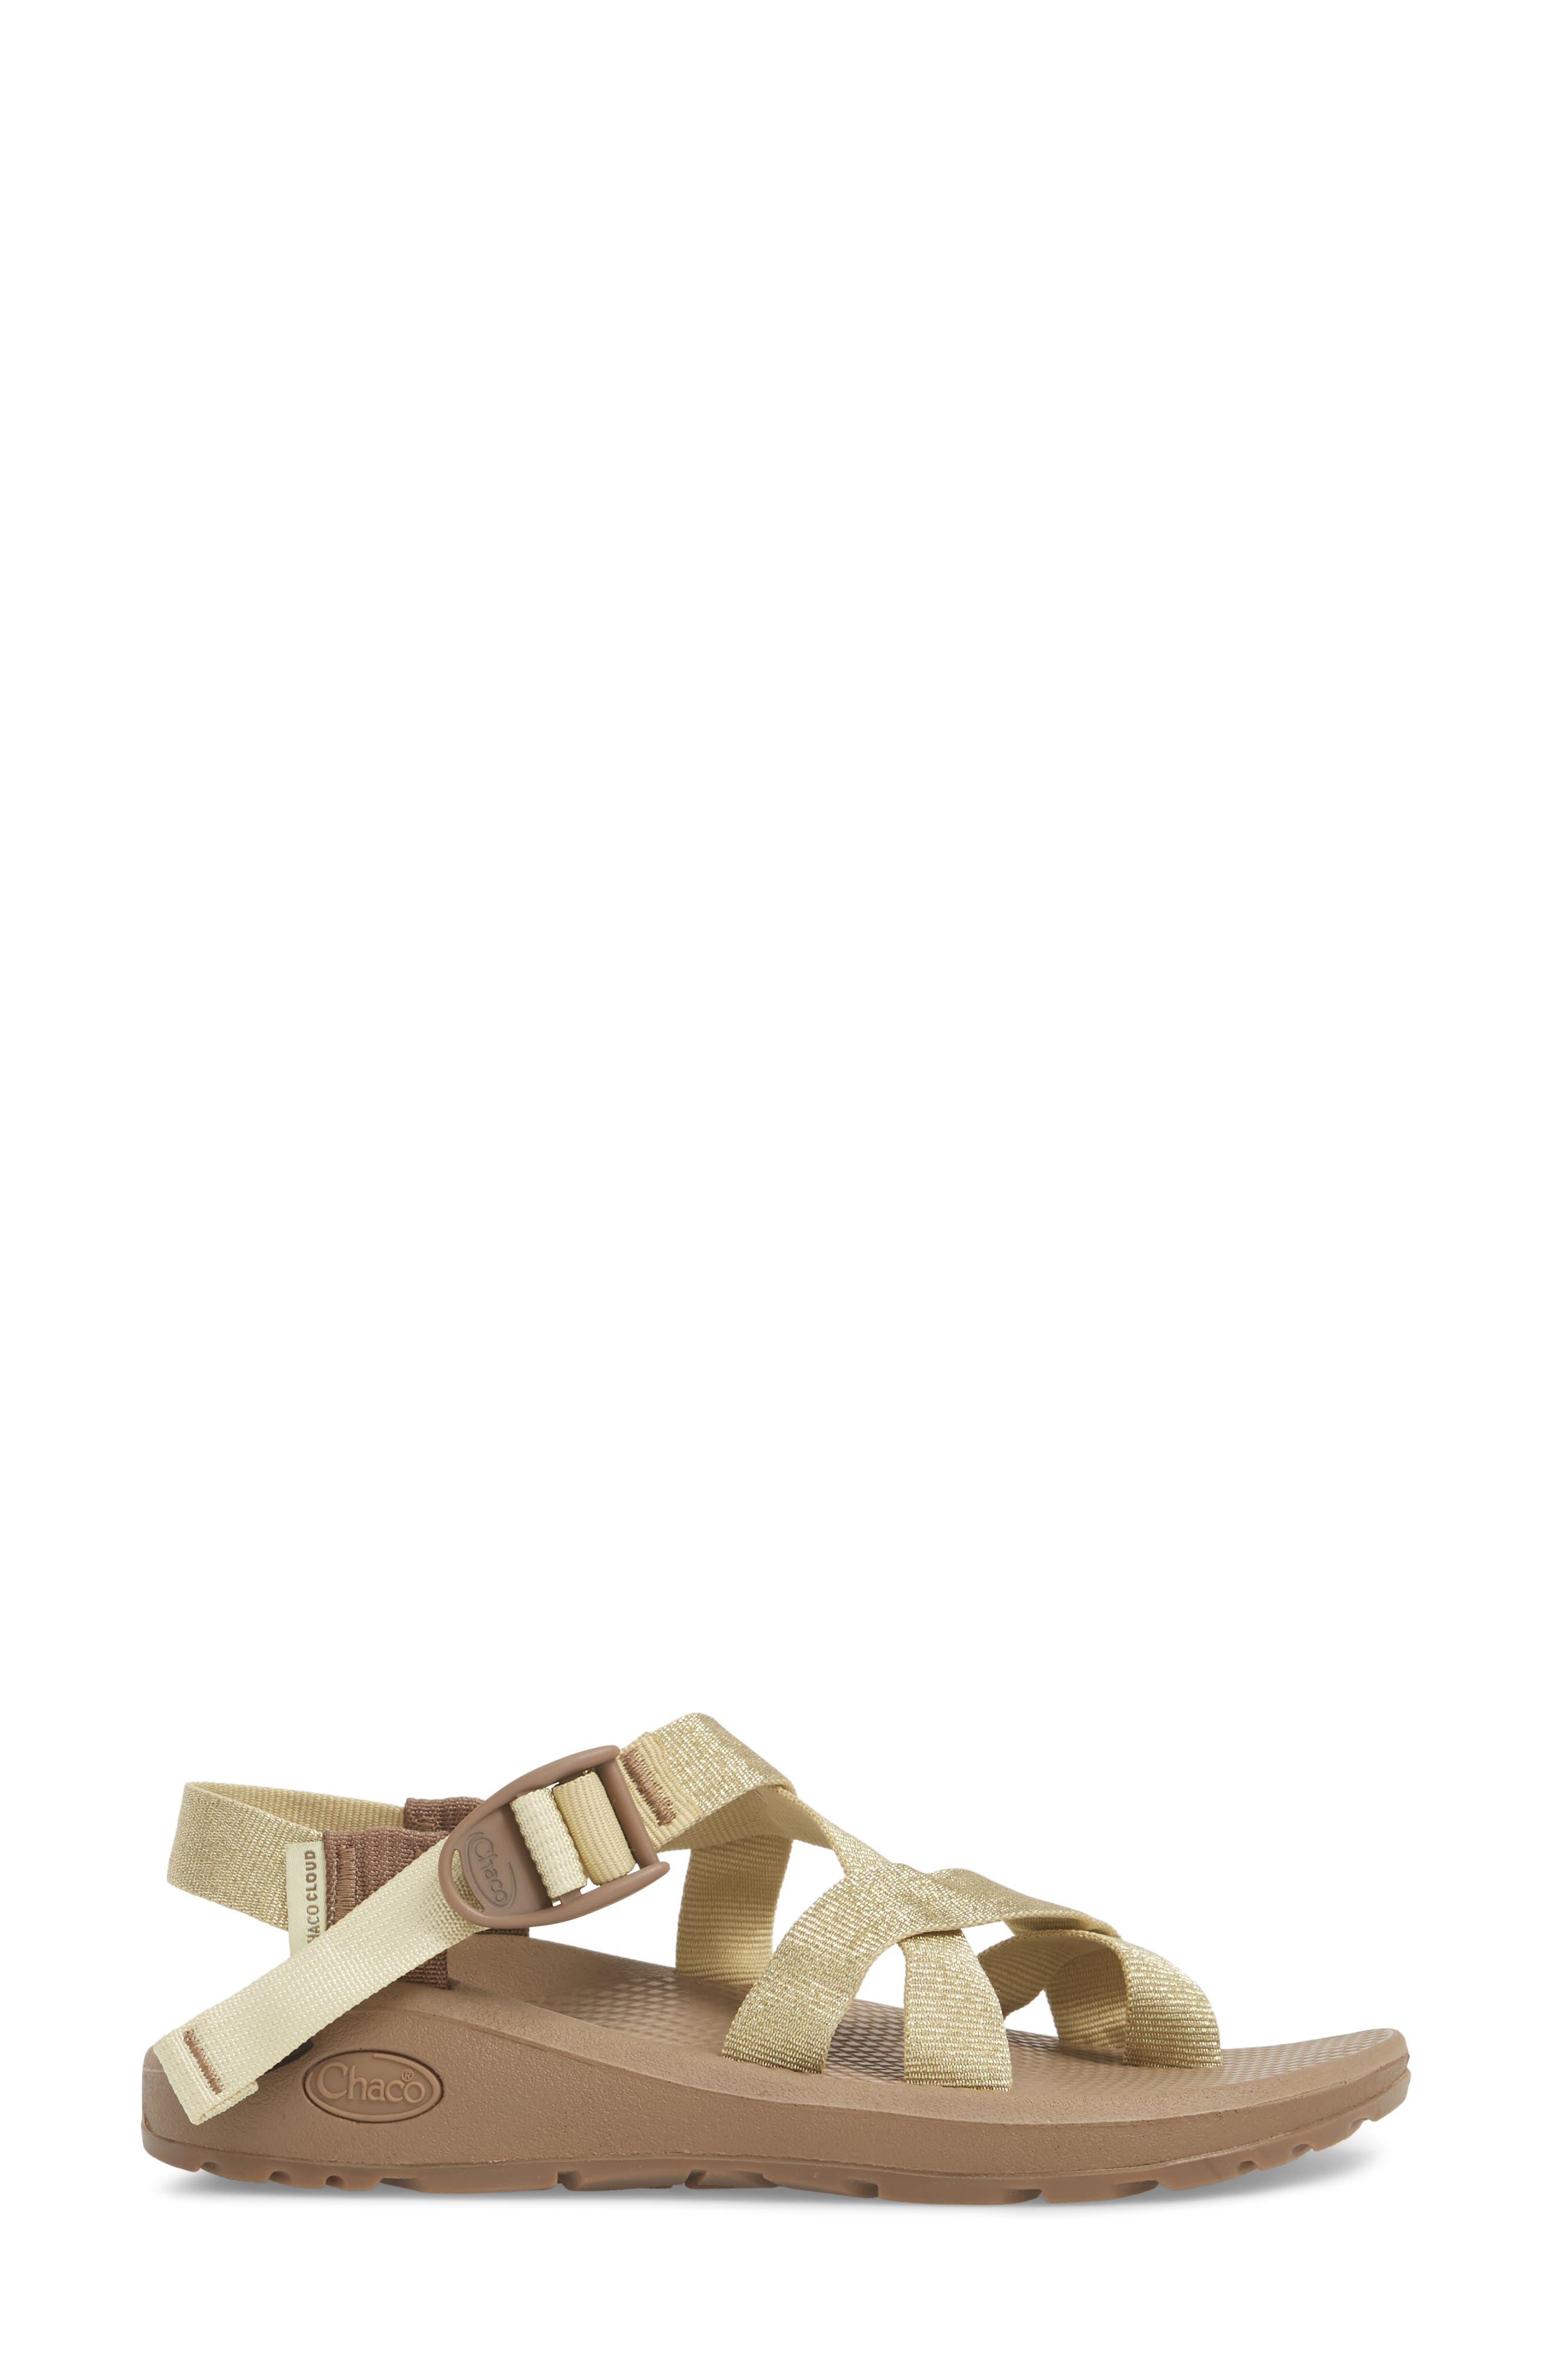 Z/Cloud 2 Sandal,                             Alternate thumbnail 3, color,                             METALLIC GOLD LEATHER